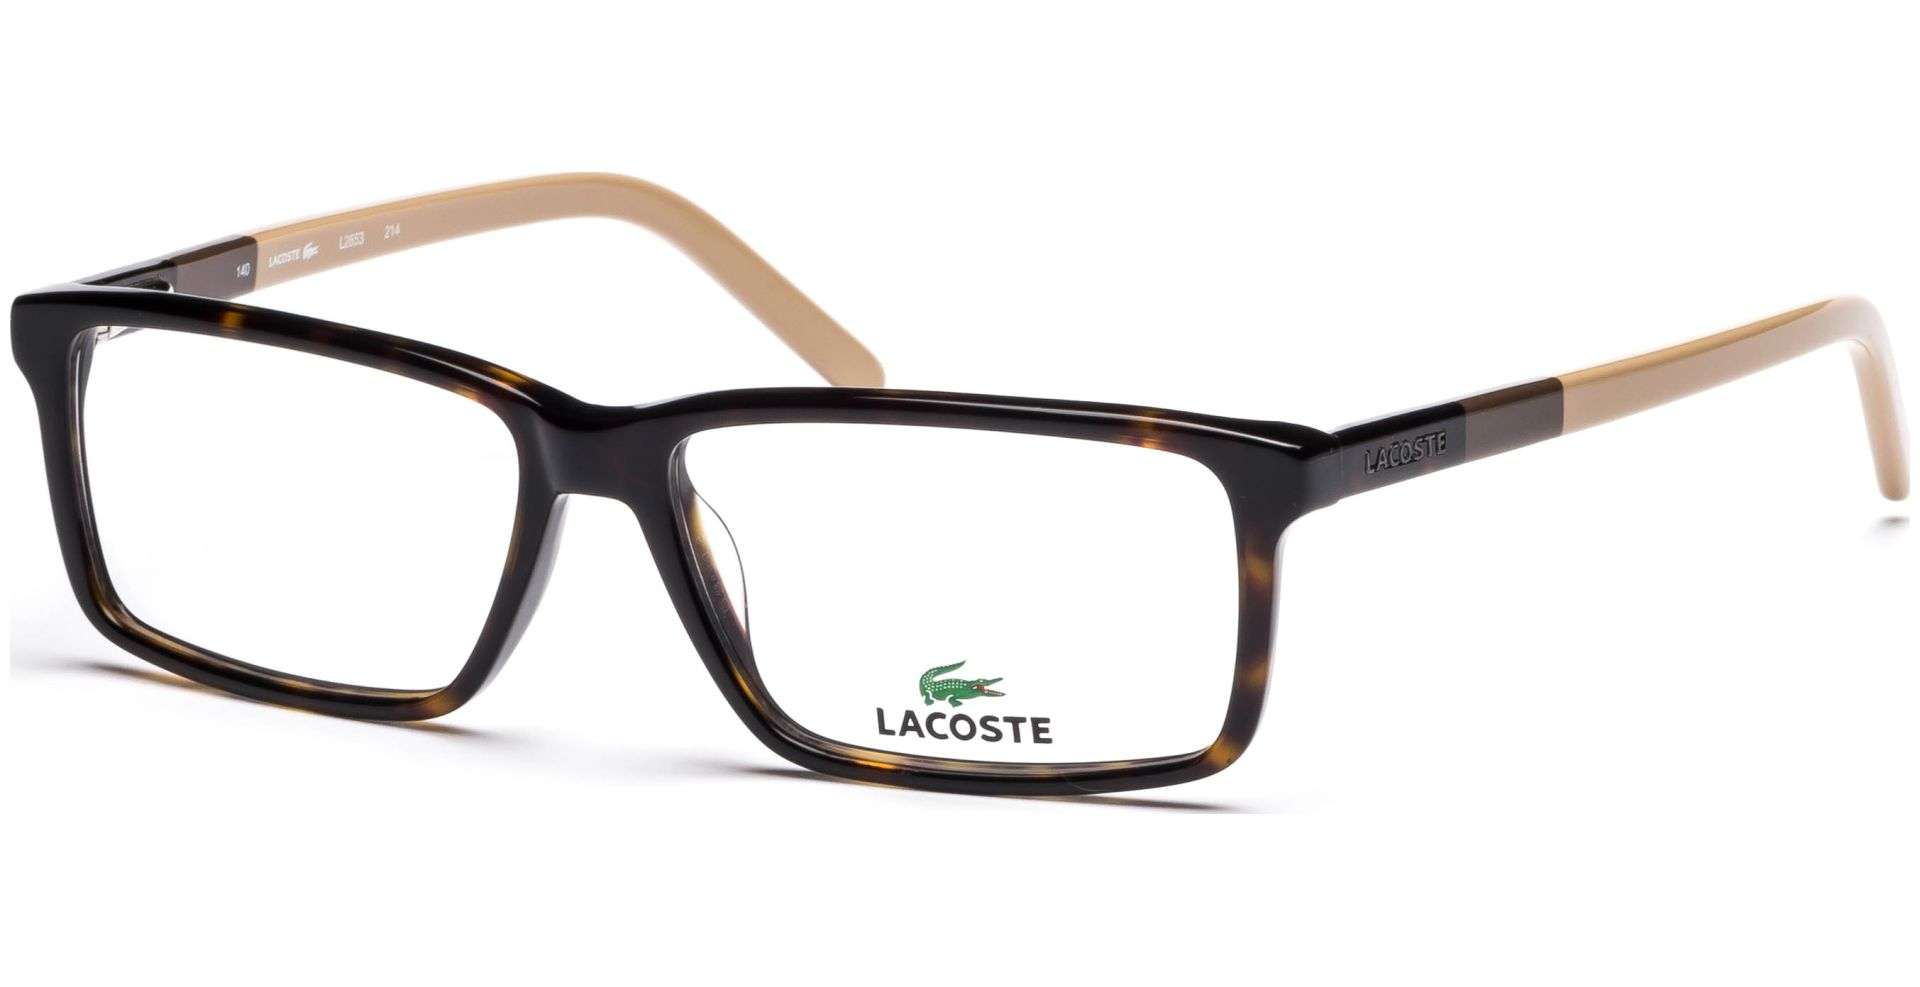 Lacoste - L2653 214 5314 Havana - von Lensbest